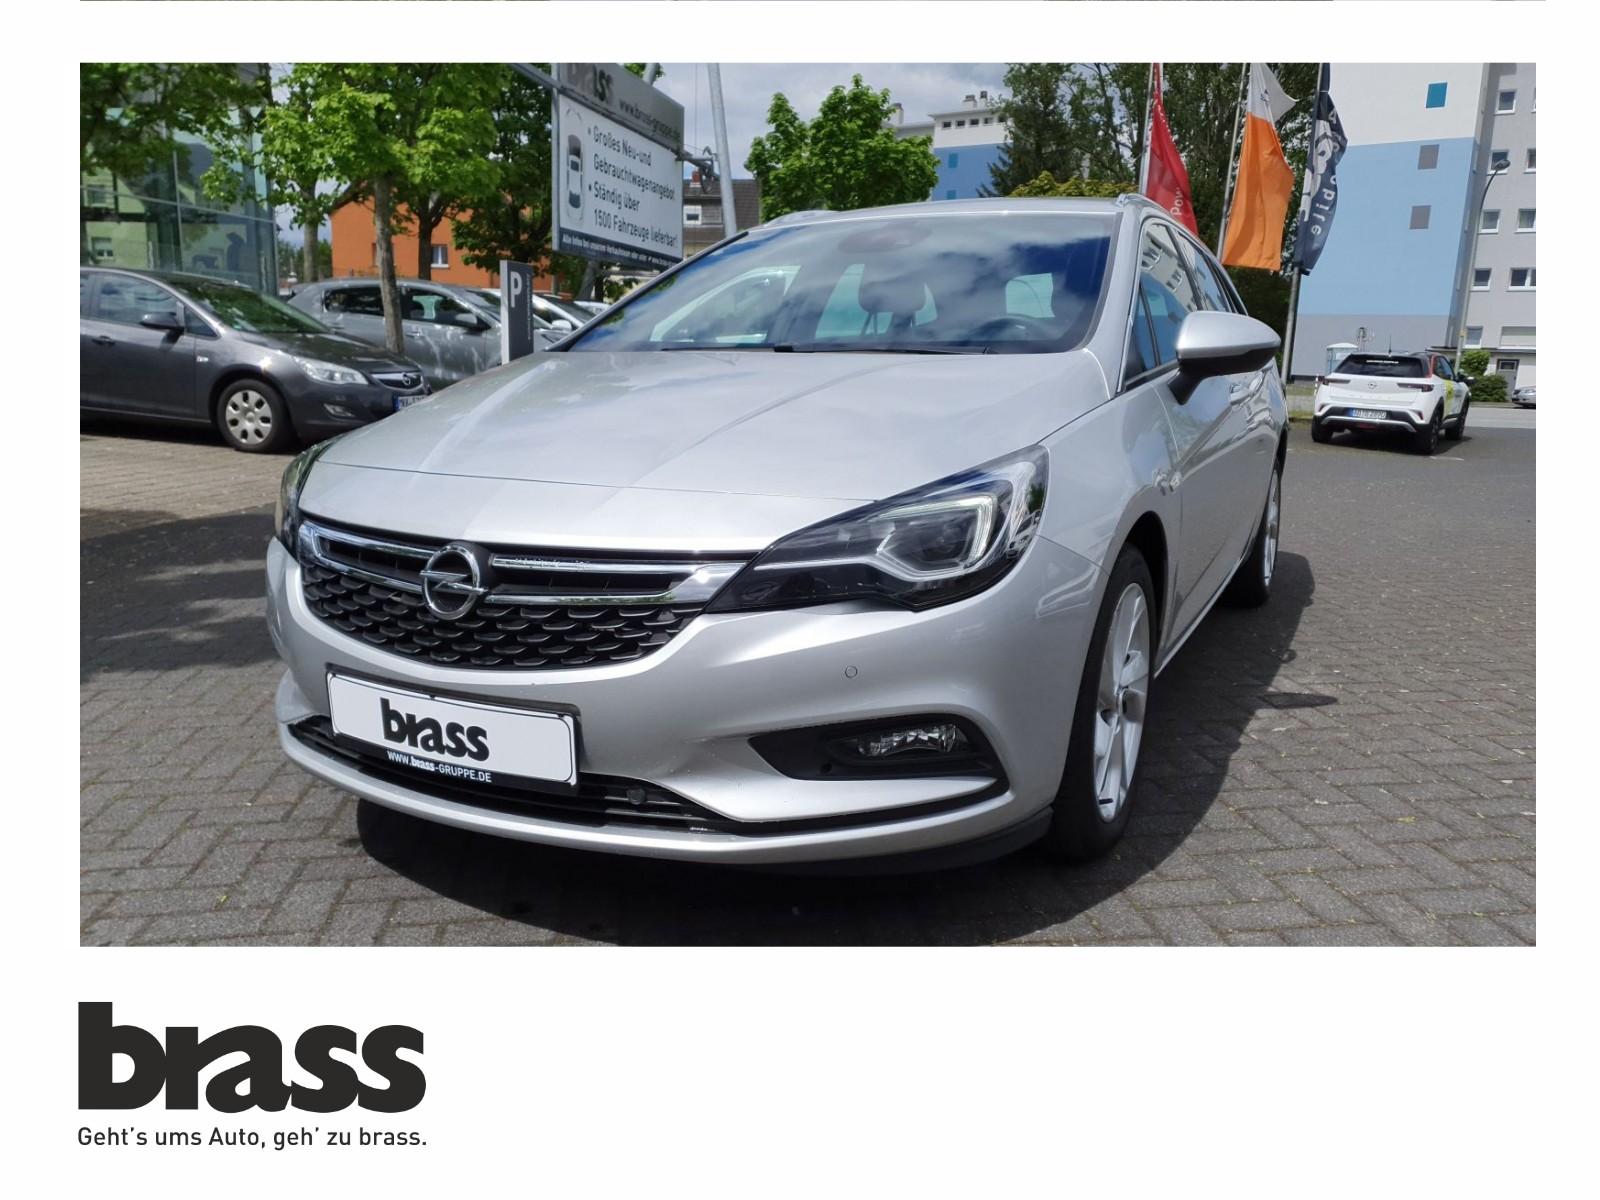 Opel Astra K Sportstourer 1.4 Turbo Dynamic, Jahr 2017, Benzin